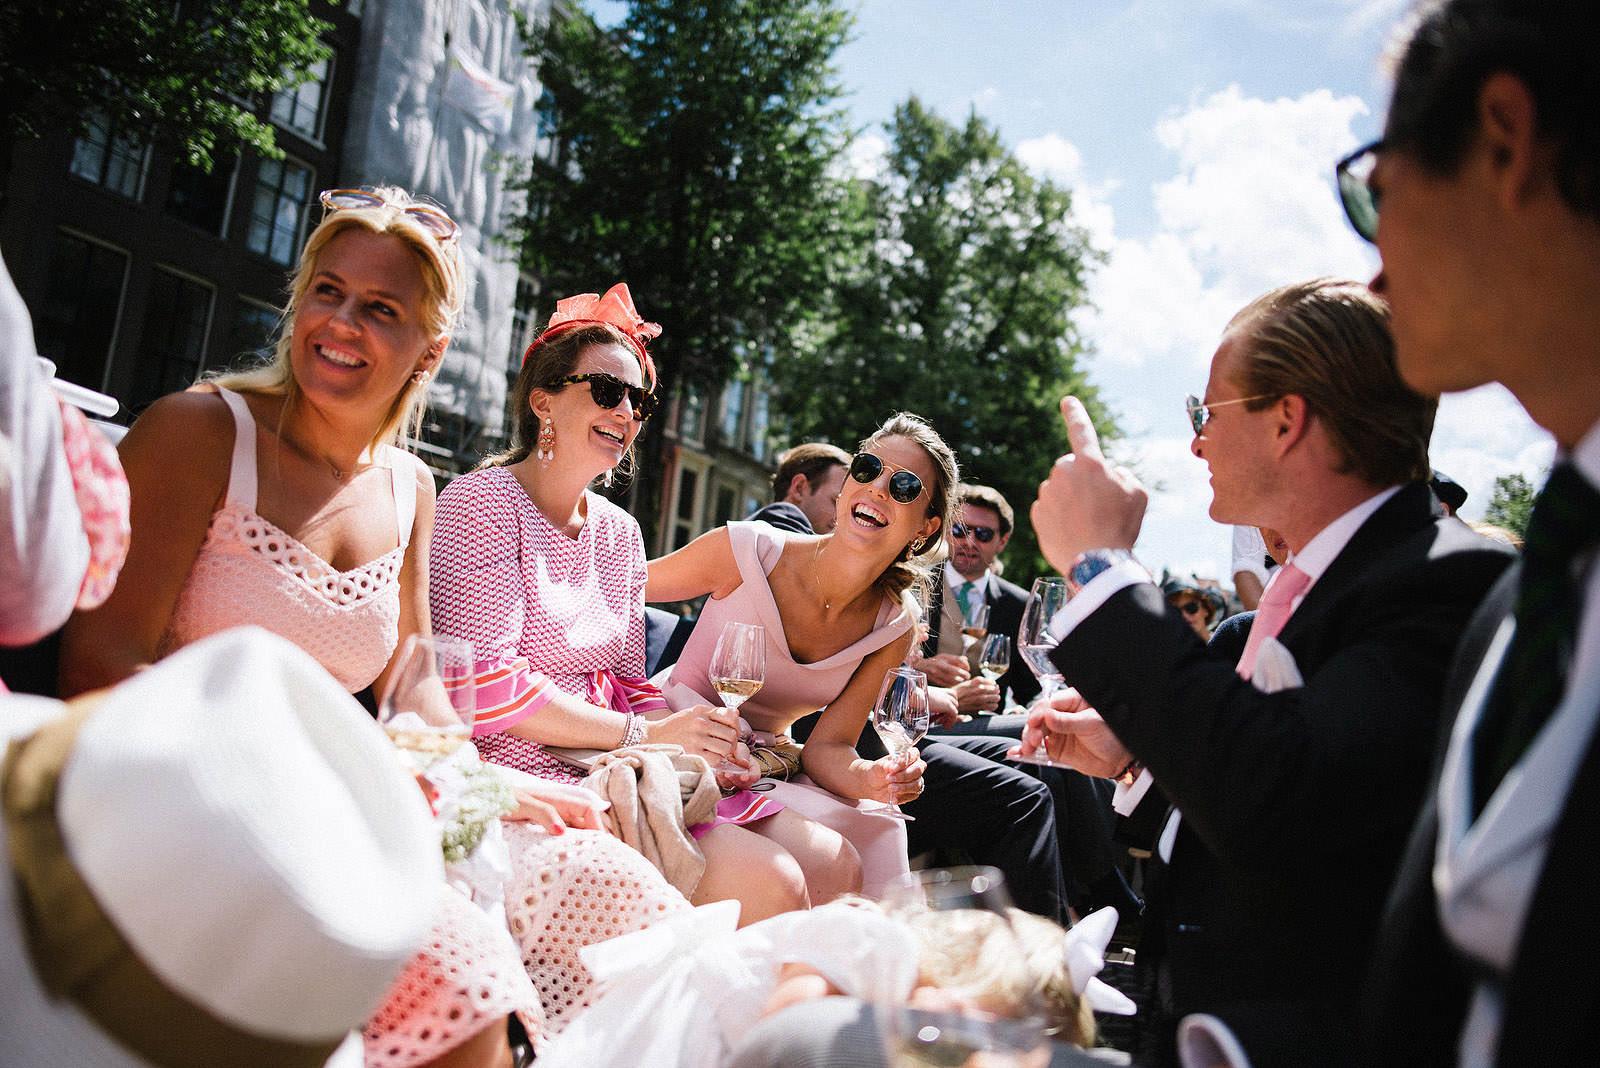 Fotograf Konstanz - Destination Wedding Photographer Amsterdam 062 - Destination Wedding Amsterdam  - 171 -